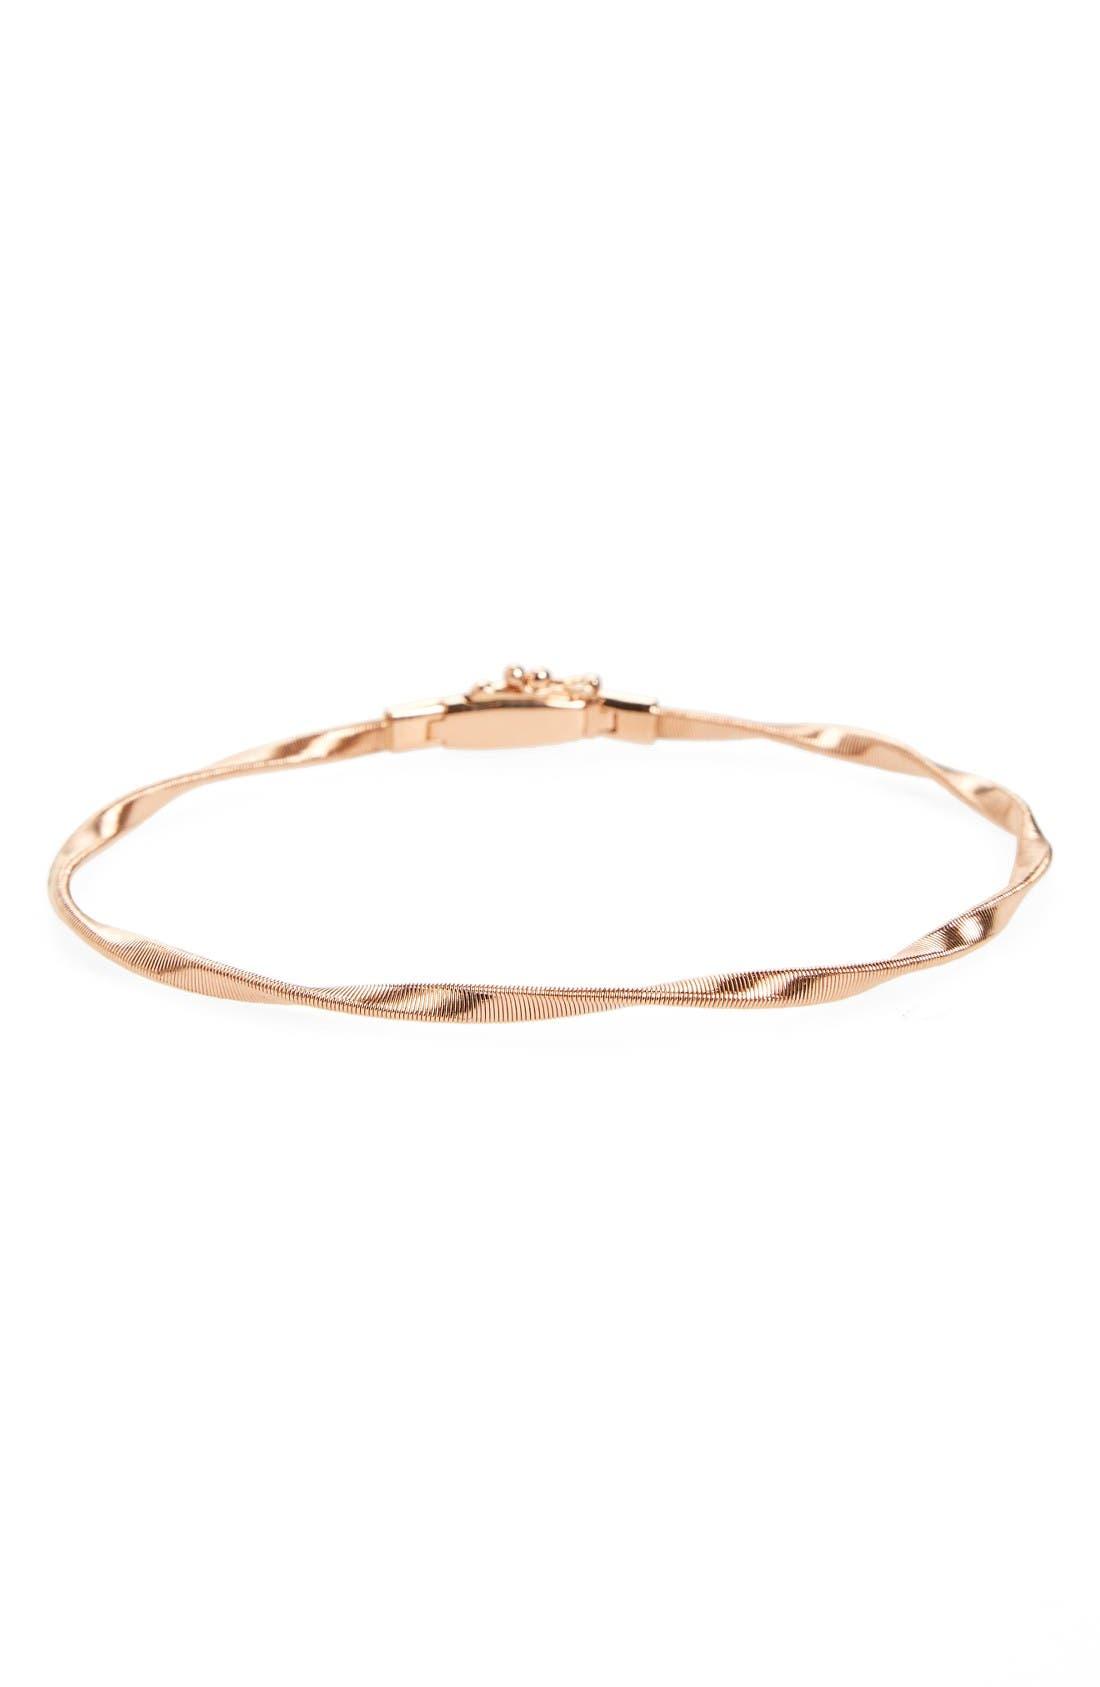 Alternate Image 1 Selected - Marco Bicego 'Marrakech' Single Strand Bracelet